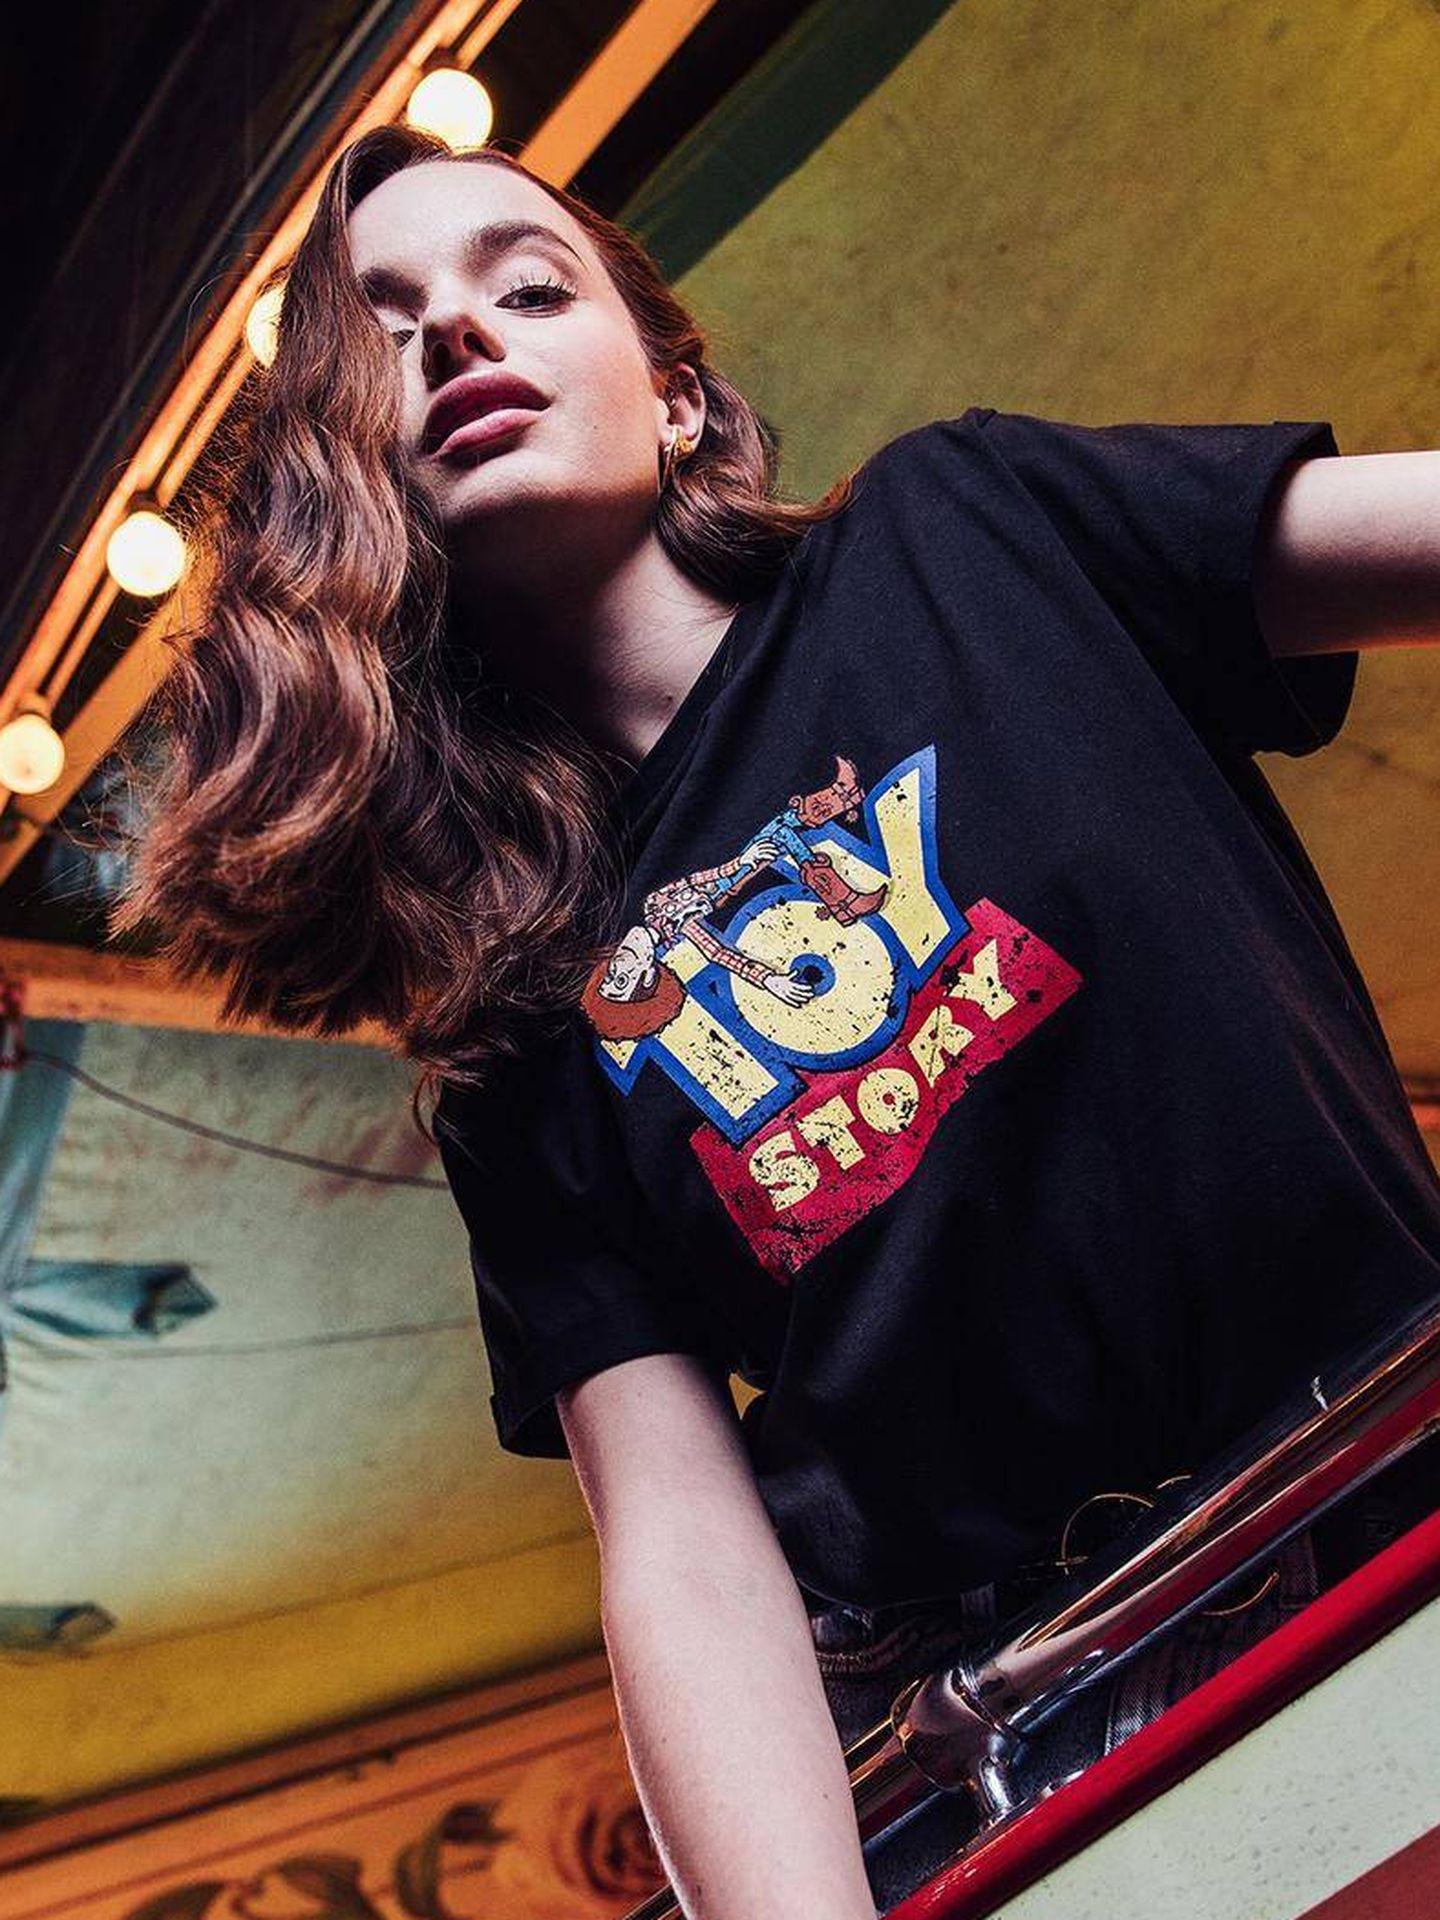 Camiseta de 'Toy Story', de Primark (10€).